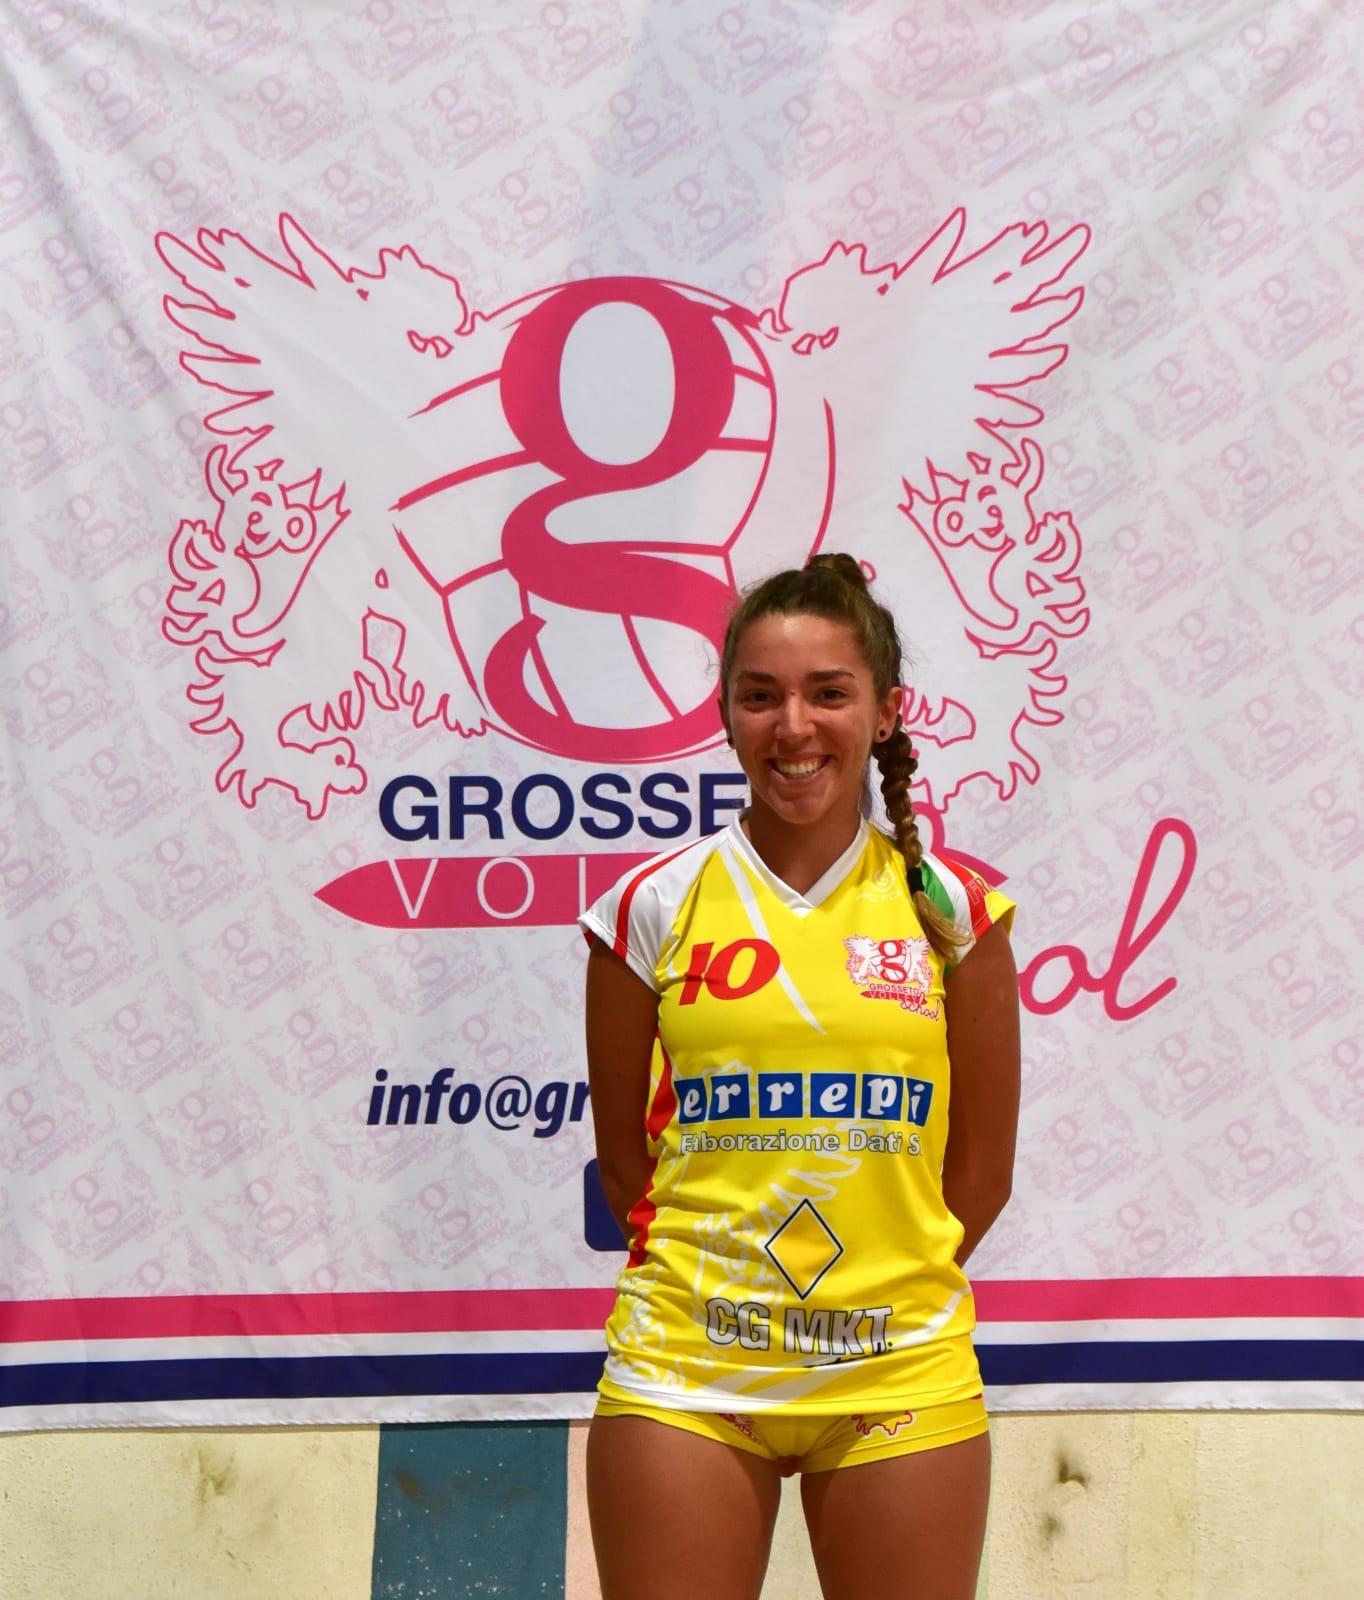 grosseto-volley-school-Laura-Cherubini-libero-squadra-serie-B2